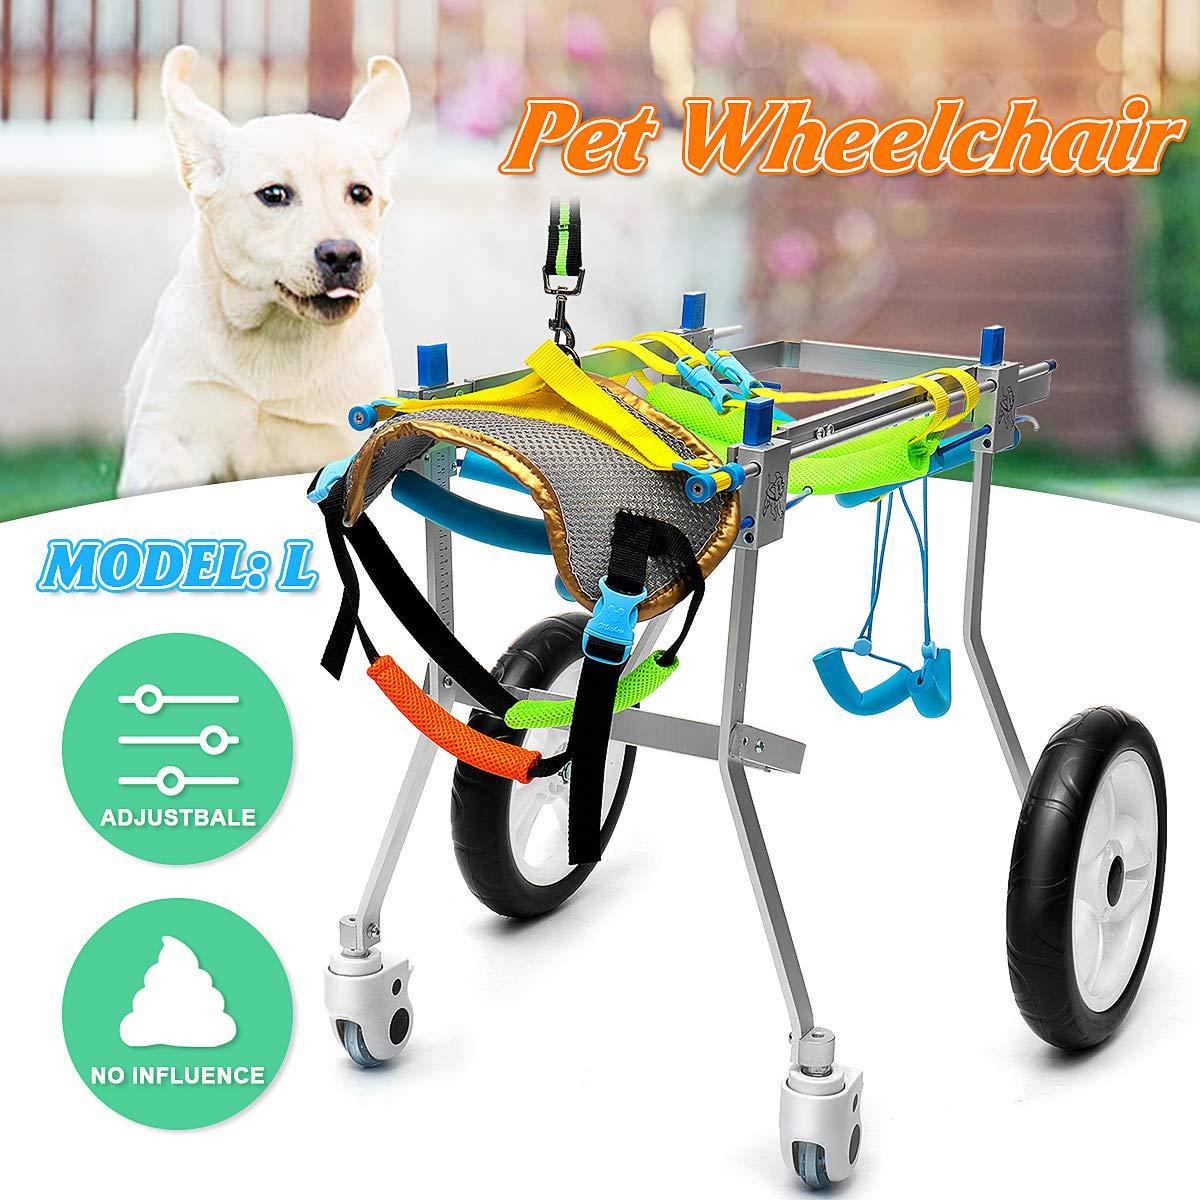 HLMF Carrito para Silla De Ruedas para Mascotas Aluminio para Discapacitados Gato Perro Patas Traseras Caminar 4 Ruedas Ajustable 73X32x61 Cm Portátil para ...